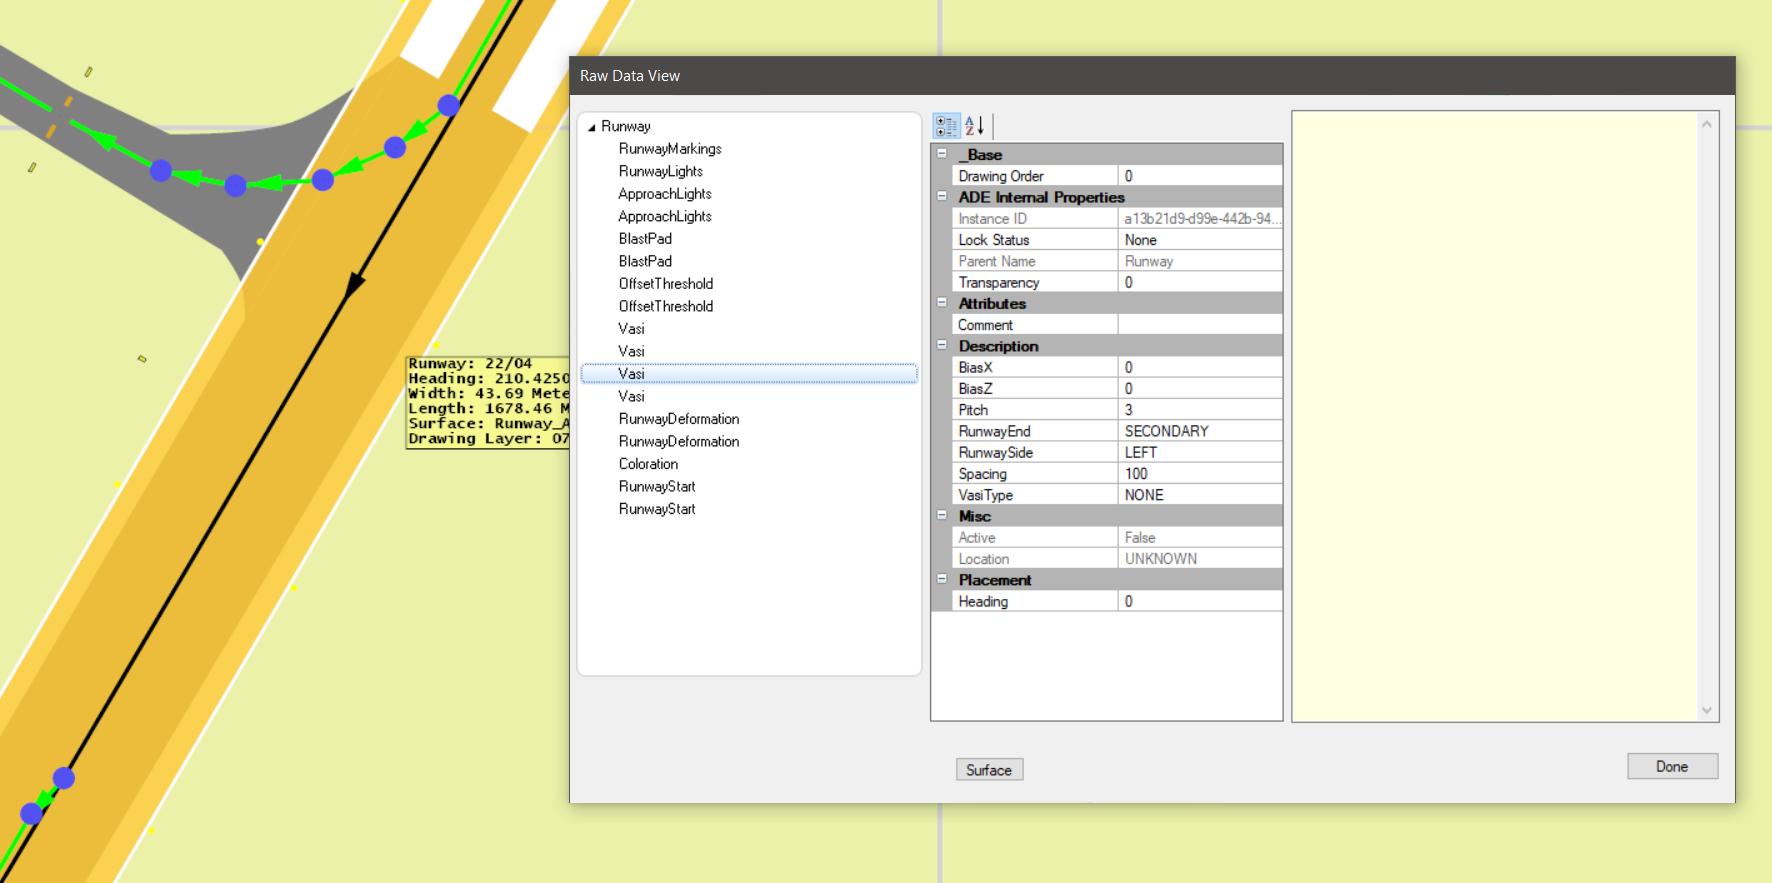 Screenshot 2021-05-09 105229.png